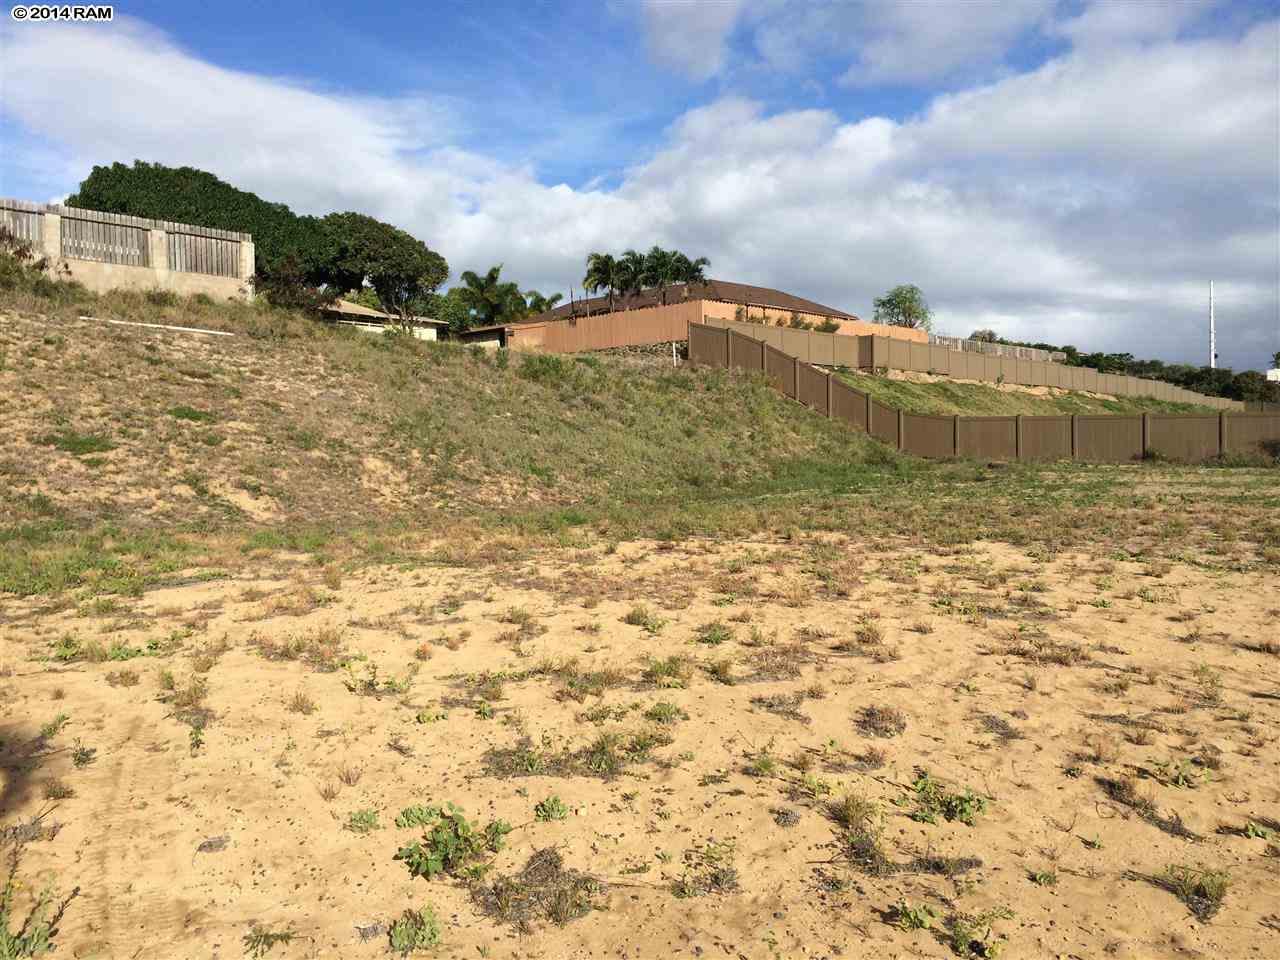 68 Keoneloa St Lot 31 Wailuku, Hi 96793 vacant land - photo 8 of 8